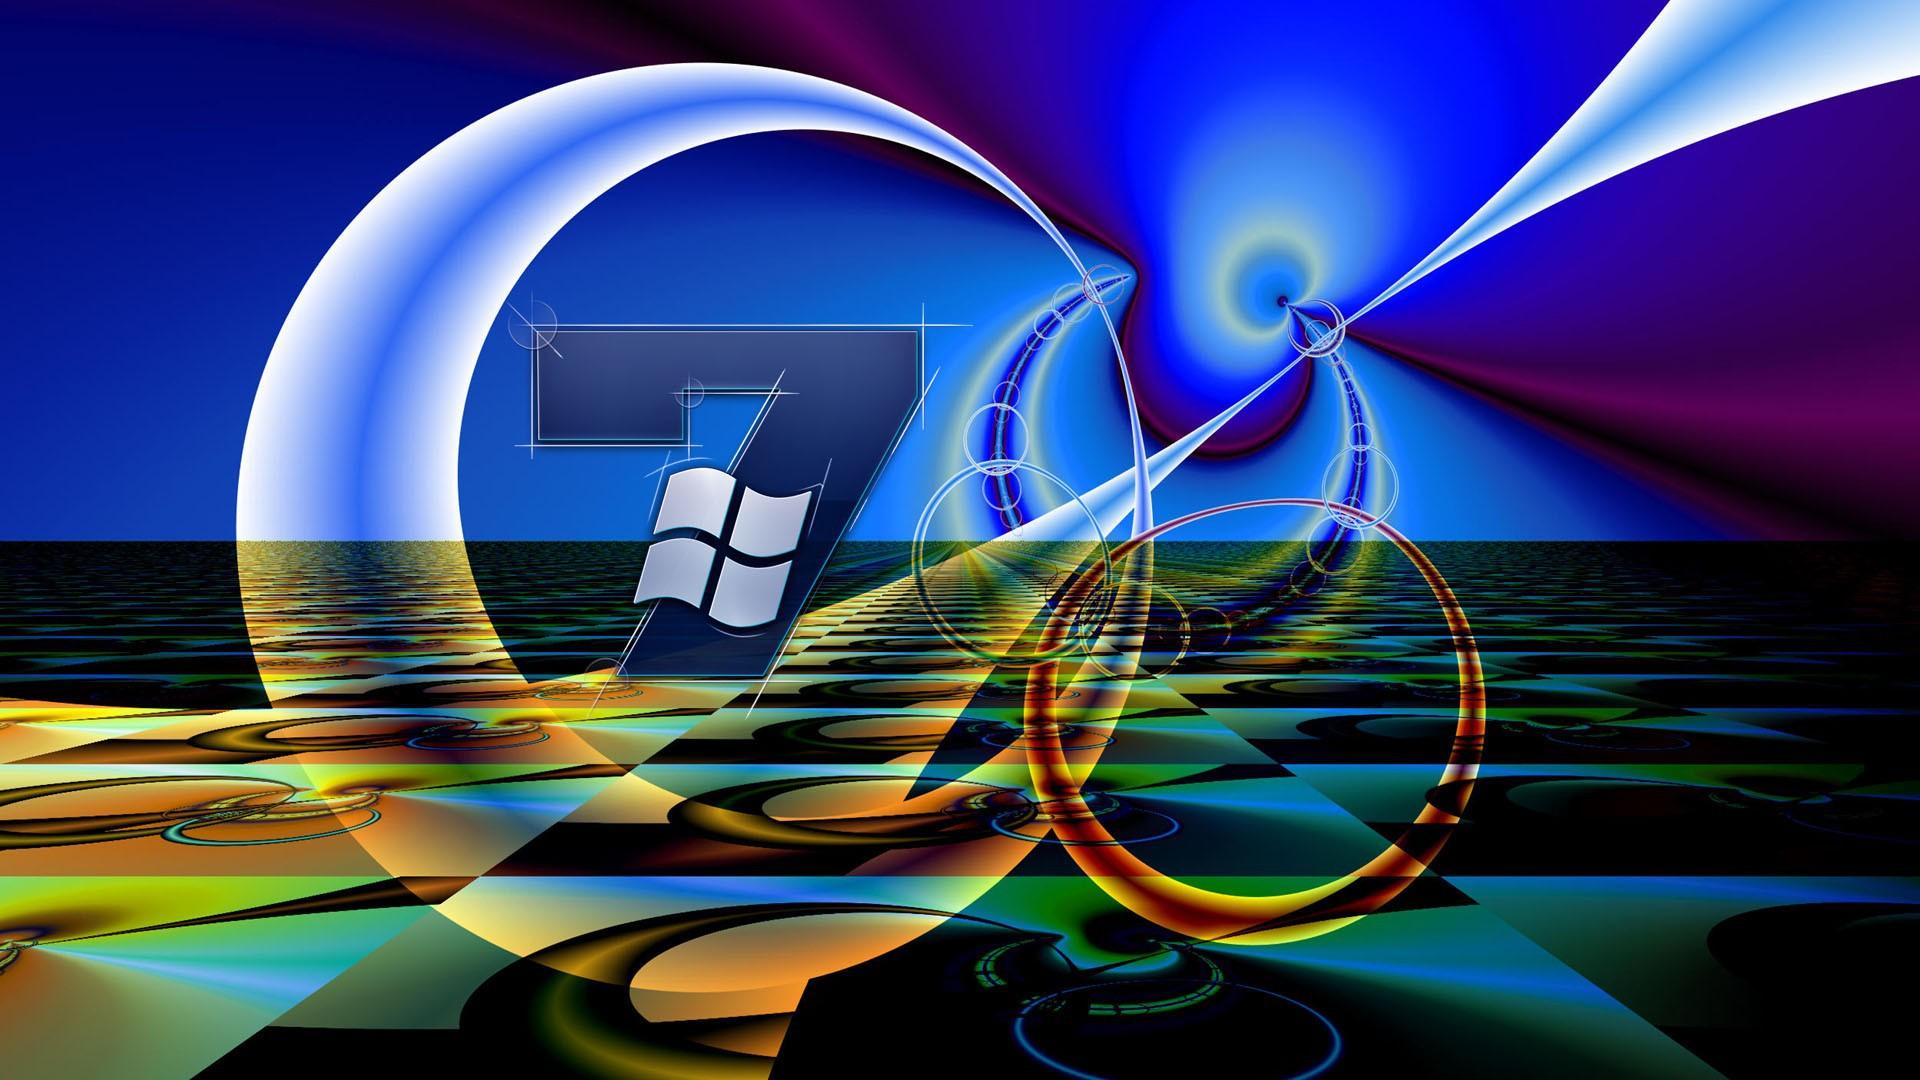 Free Wallpaper For Laptops Windows 7 Wallpapersafari